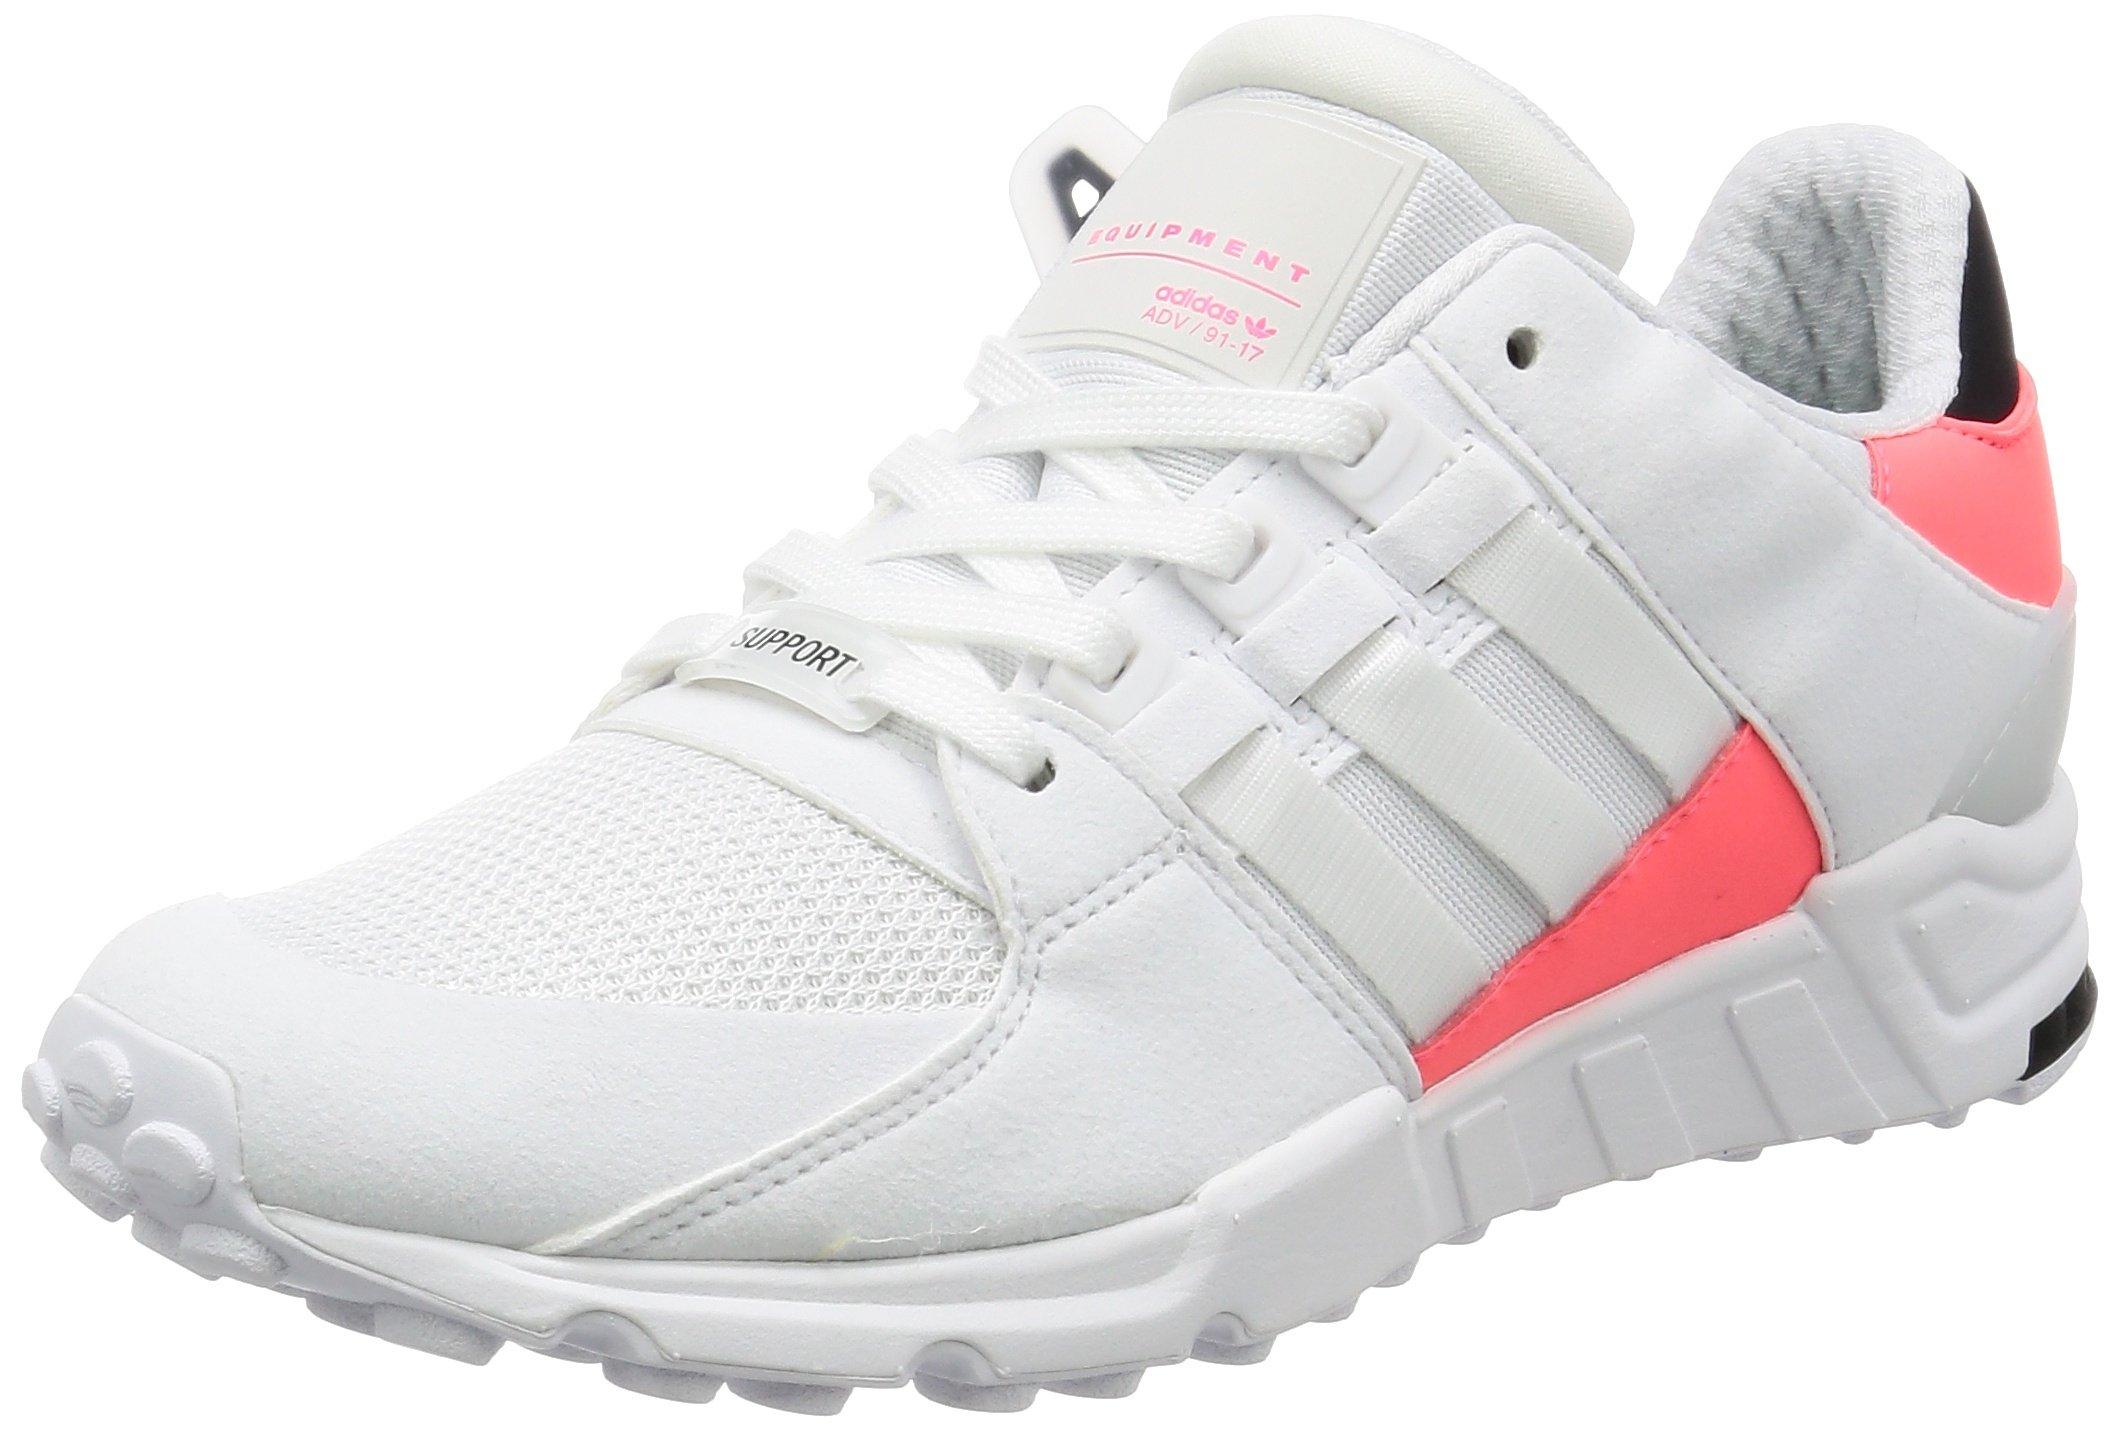 online store 80264 14b42 adidas Originals Men's ' EQT Support Rf Trainers US9.5 White